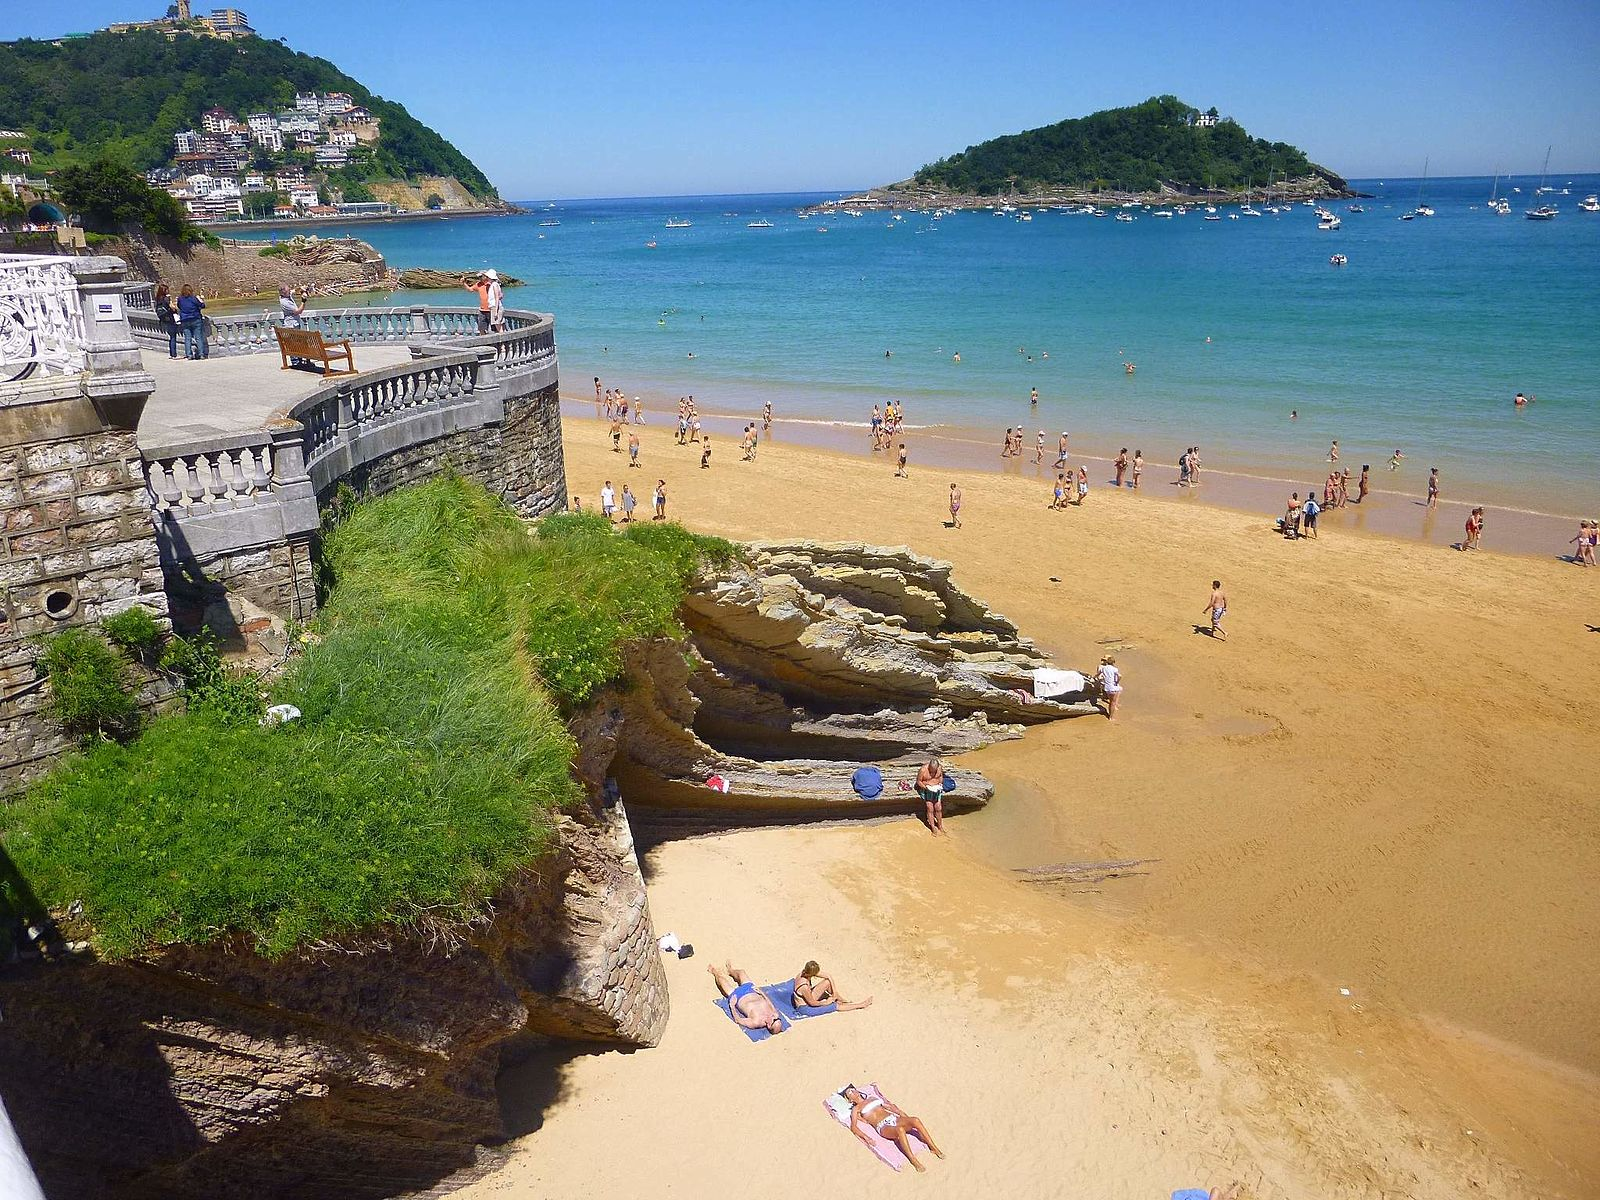 Playa De La Concha San Sebastián Spain Zarateman Wikimedia Commons